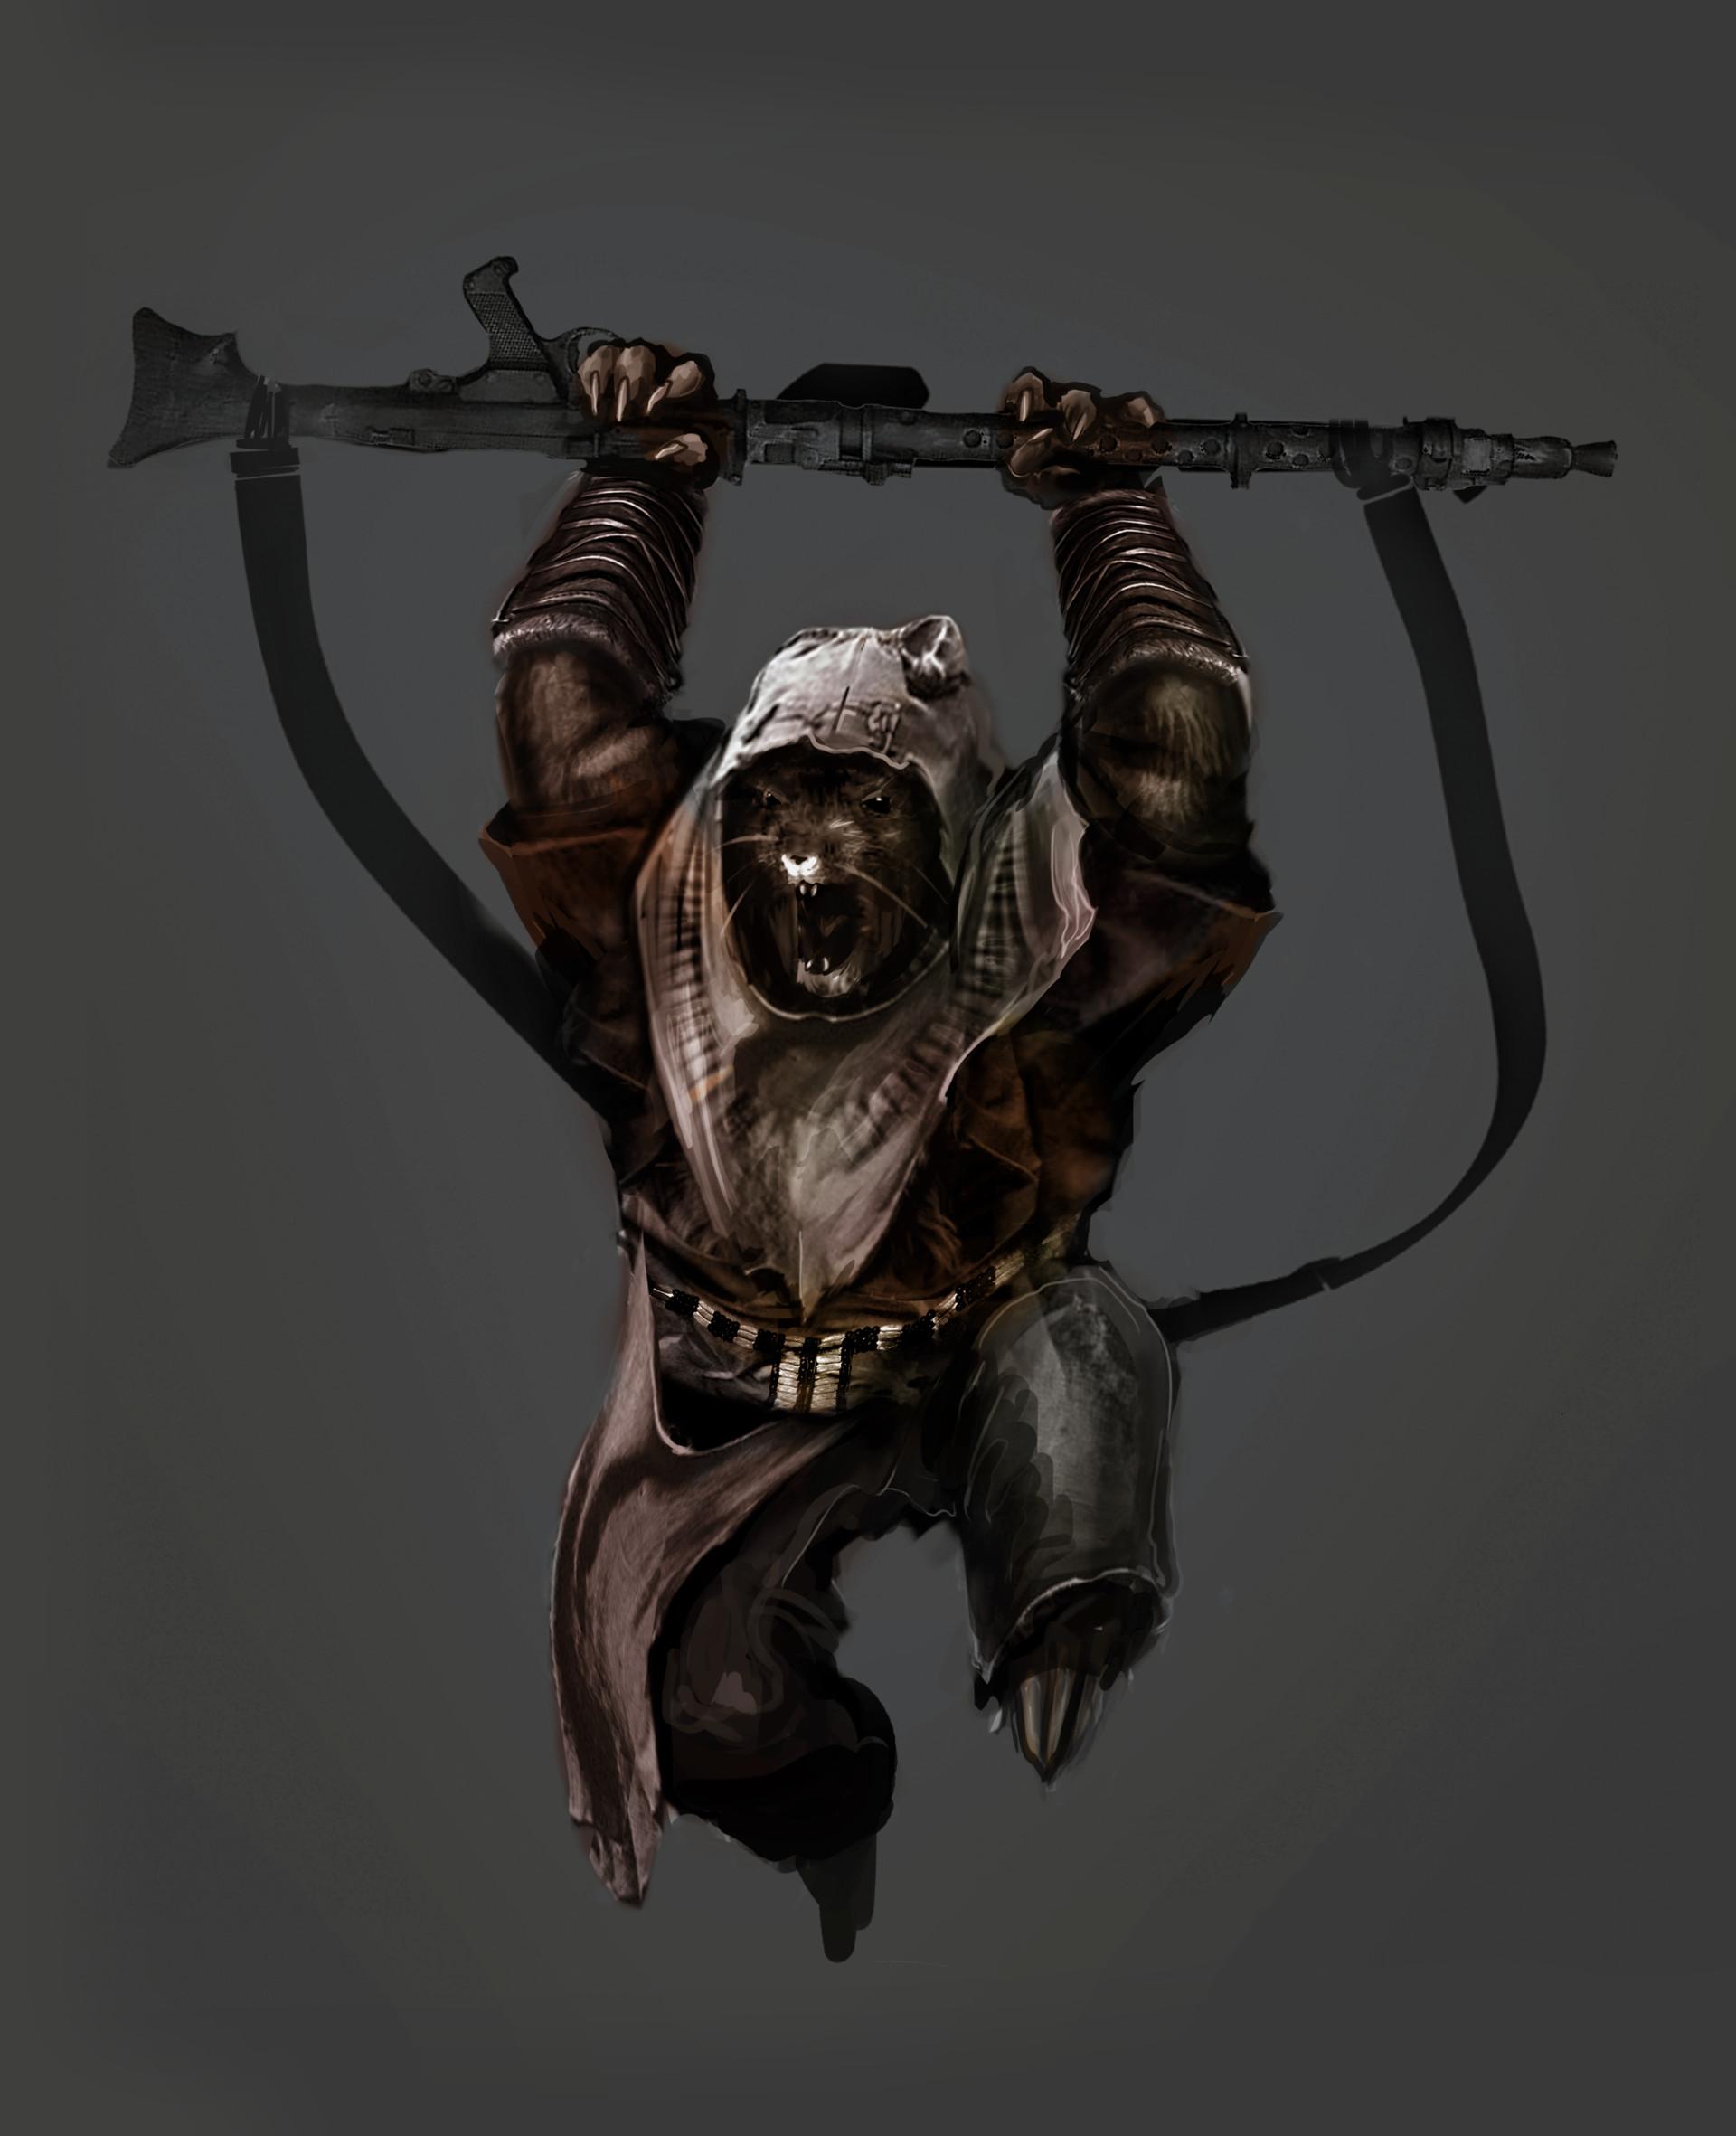 Theophile loaec star wars ewok champion by thomaslean d82wzvl